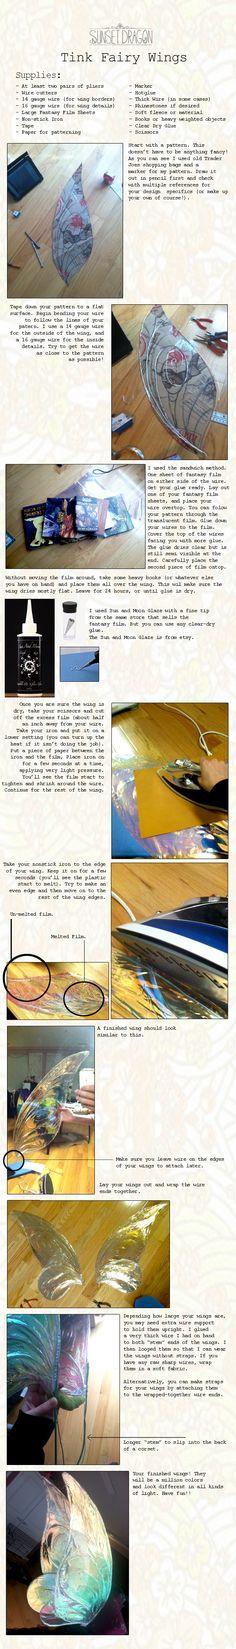 fantasy_film_wing_tutorial_by_flying_fox-d5jz6ww.jpg (600×4194)